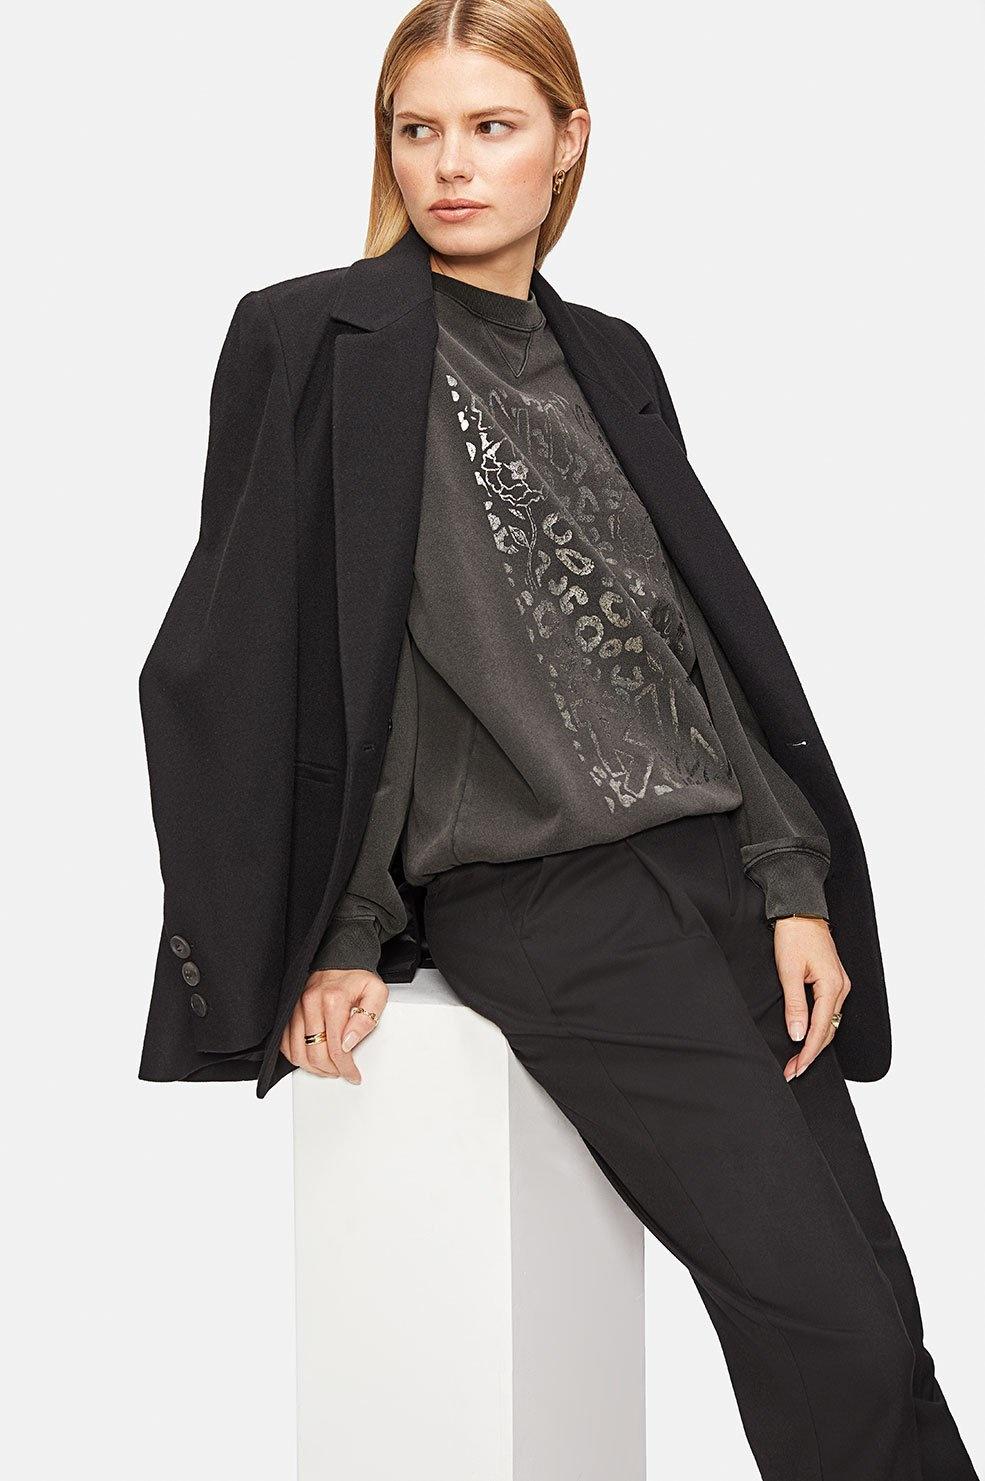 Ramona Leopard Sweatshirt - Washed Black-4